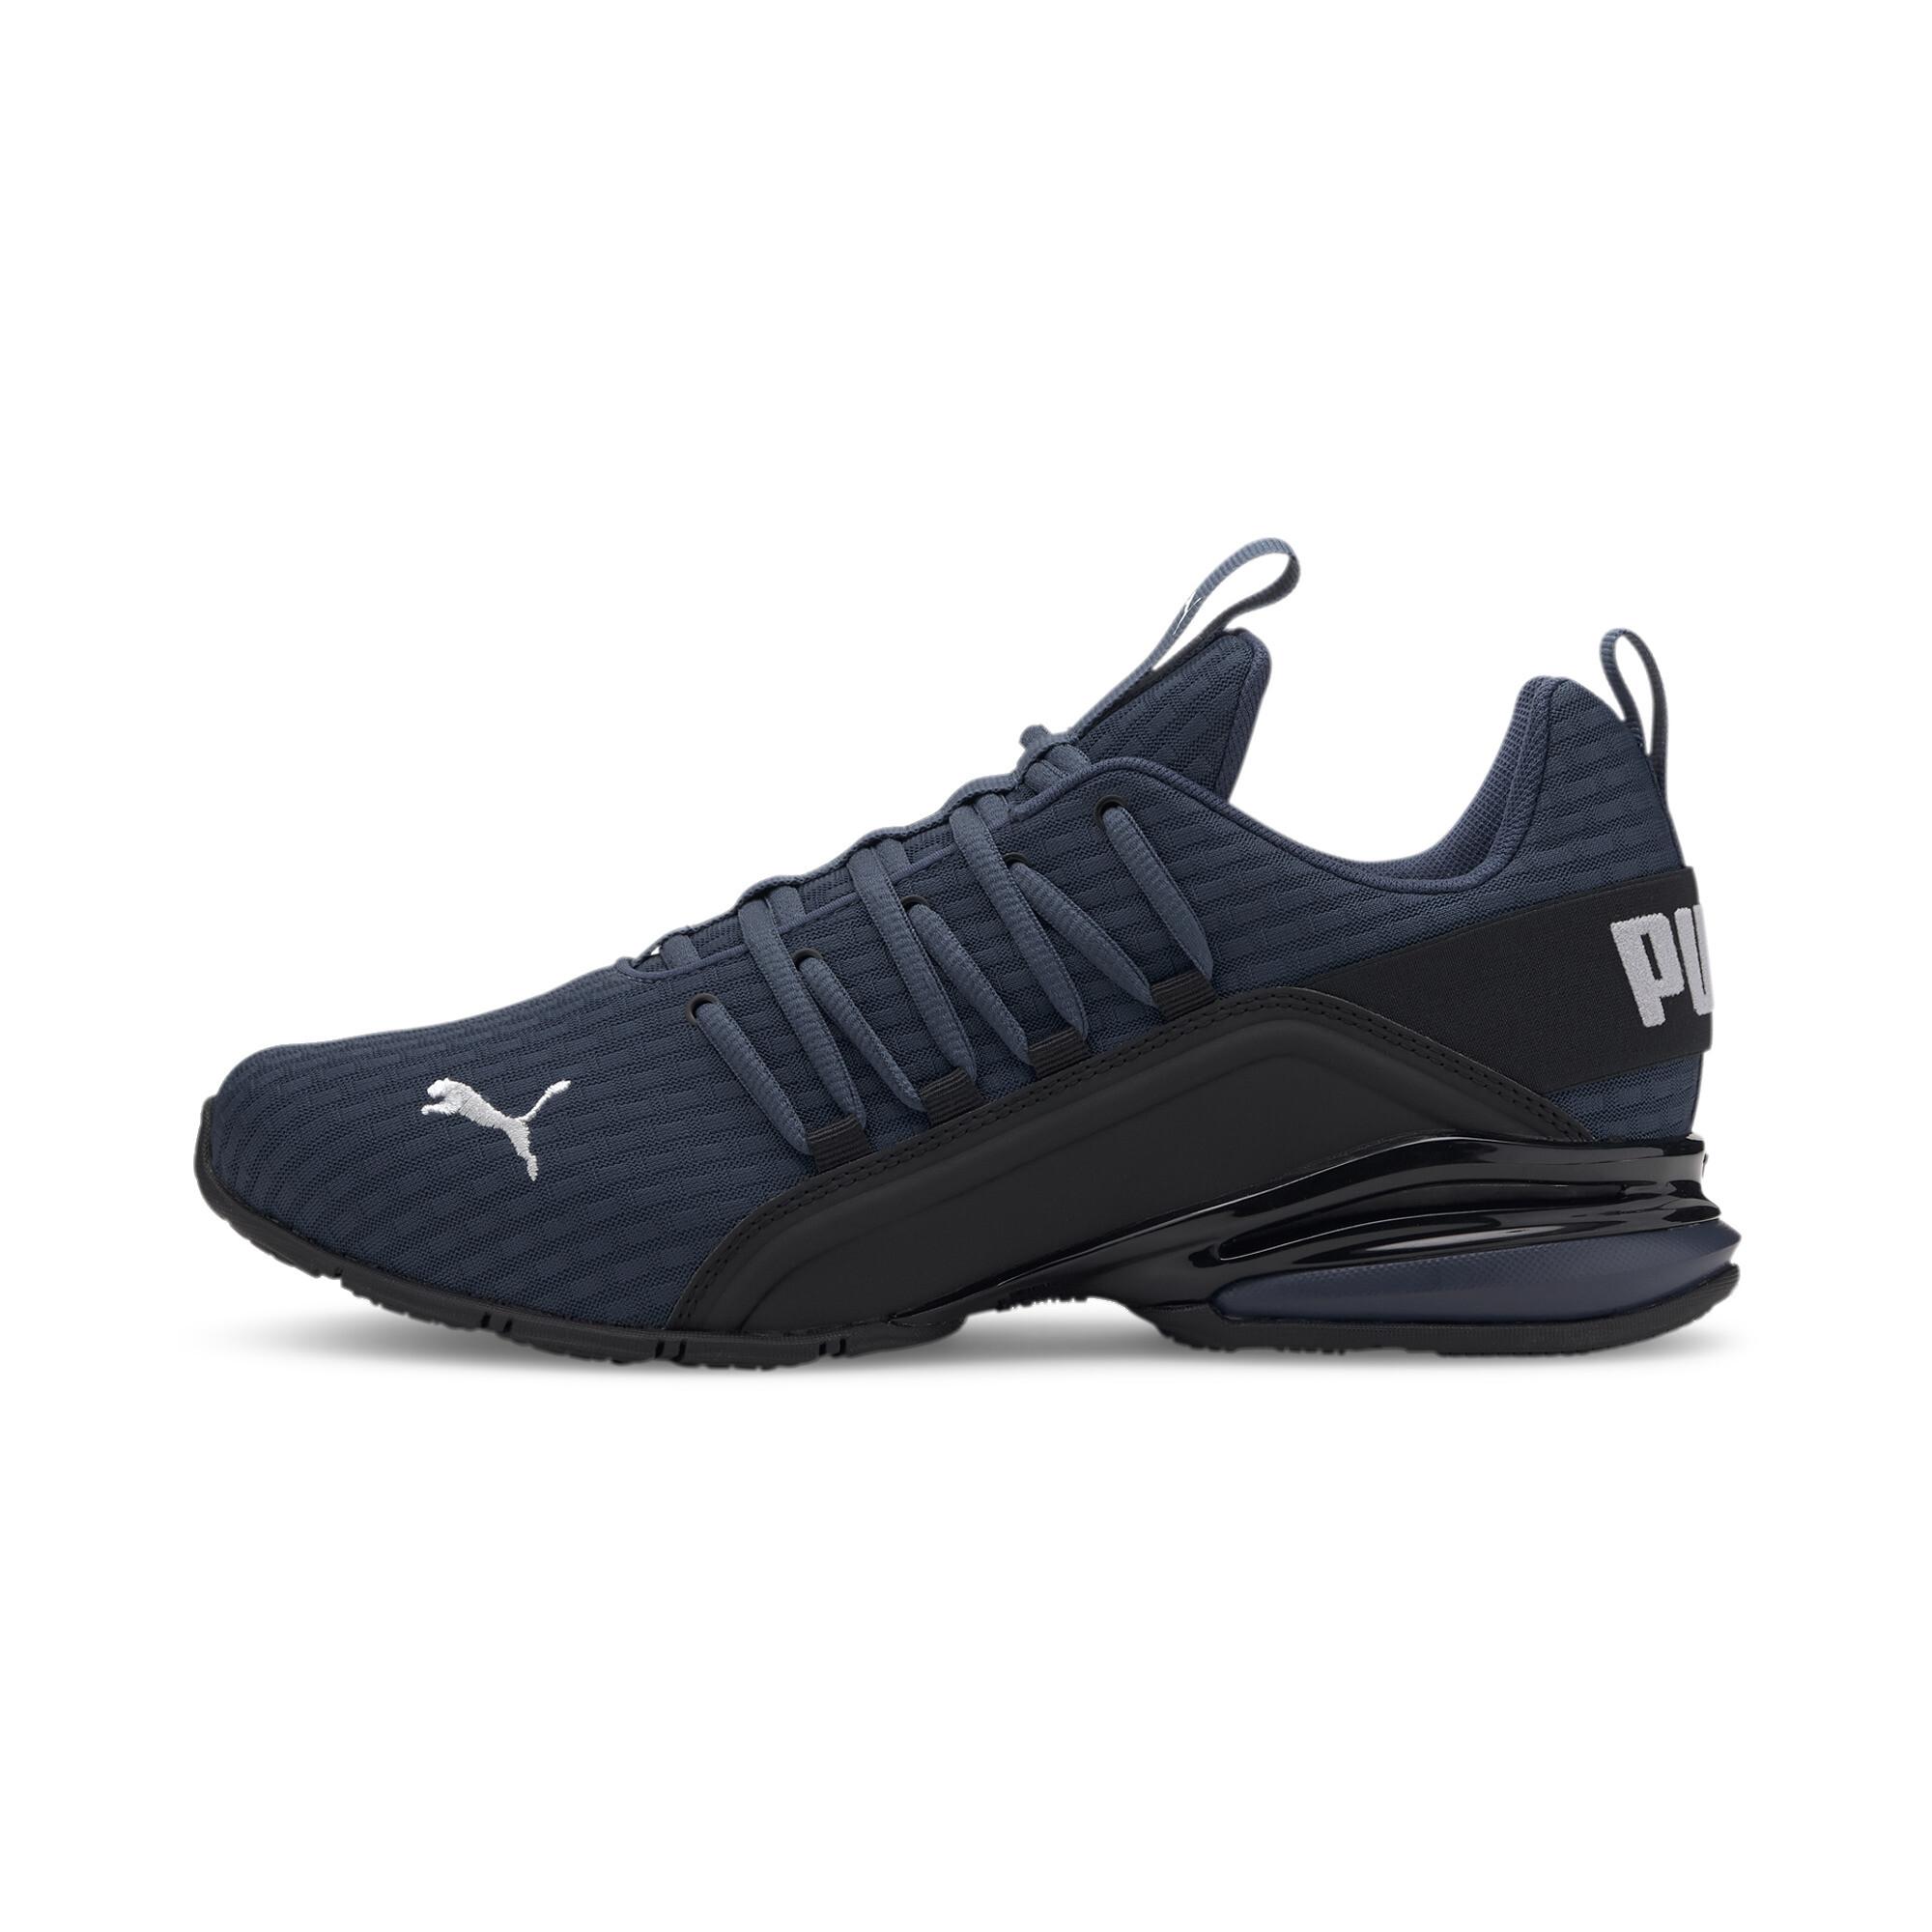 PUMA-Men-039-s-Axelion-Block-Running-Shoes thumbnail 4